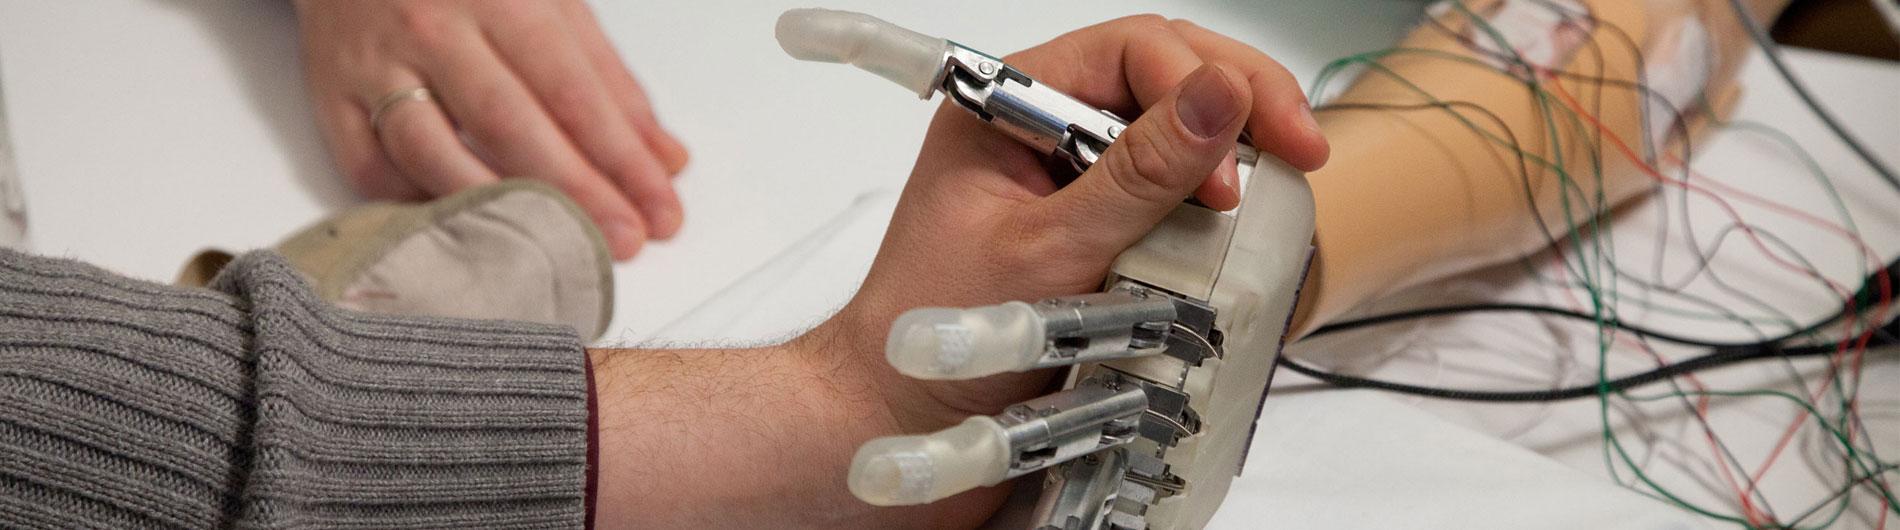 Sorensen prosthetic arm